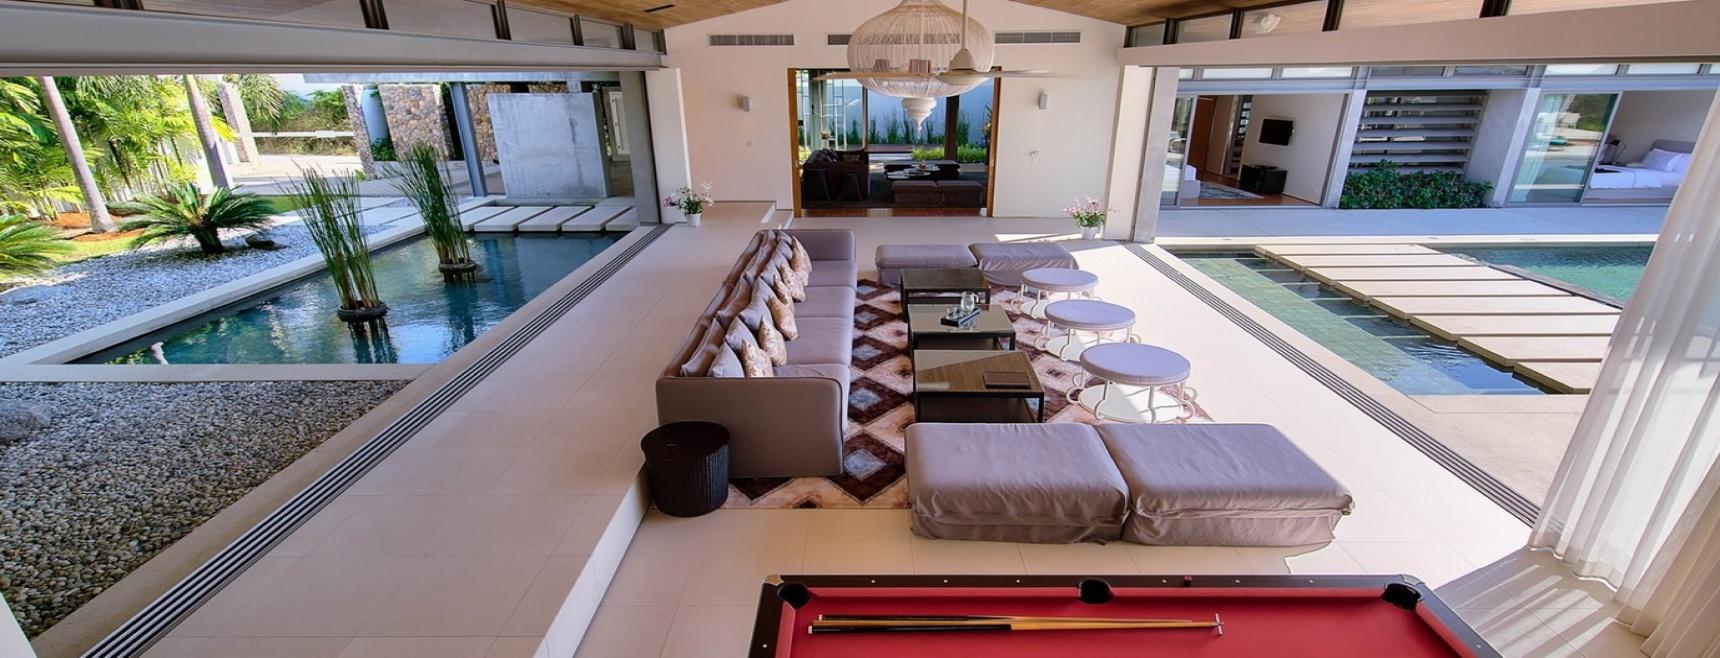 Villa Sava1 Tievoli 7 Bedroom(Thai-Real.com)